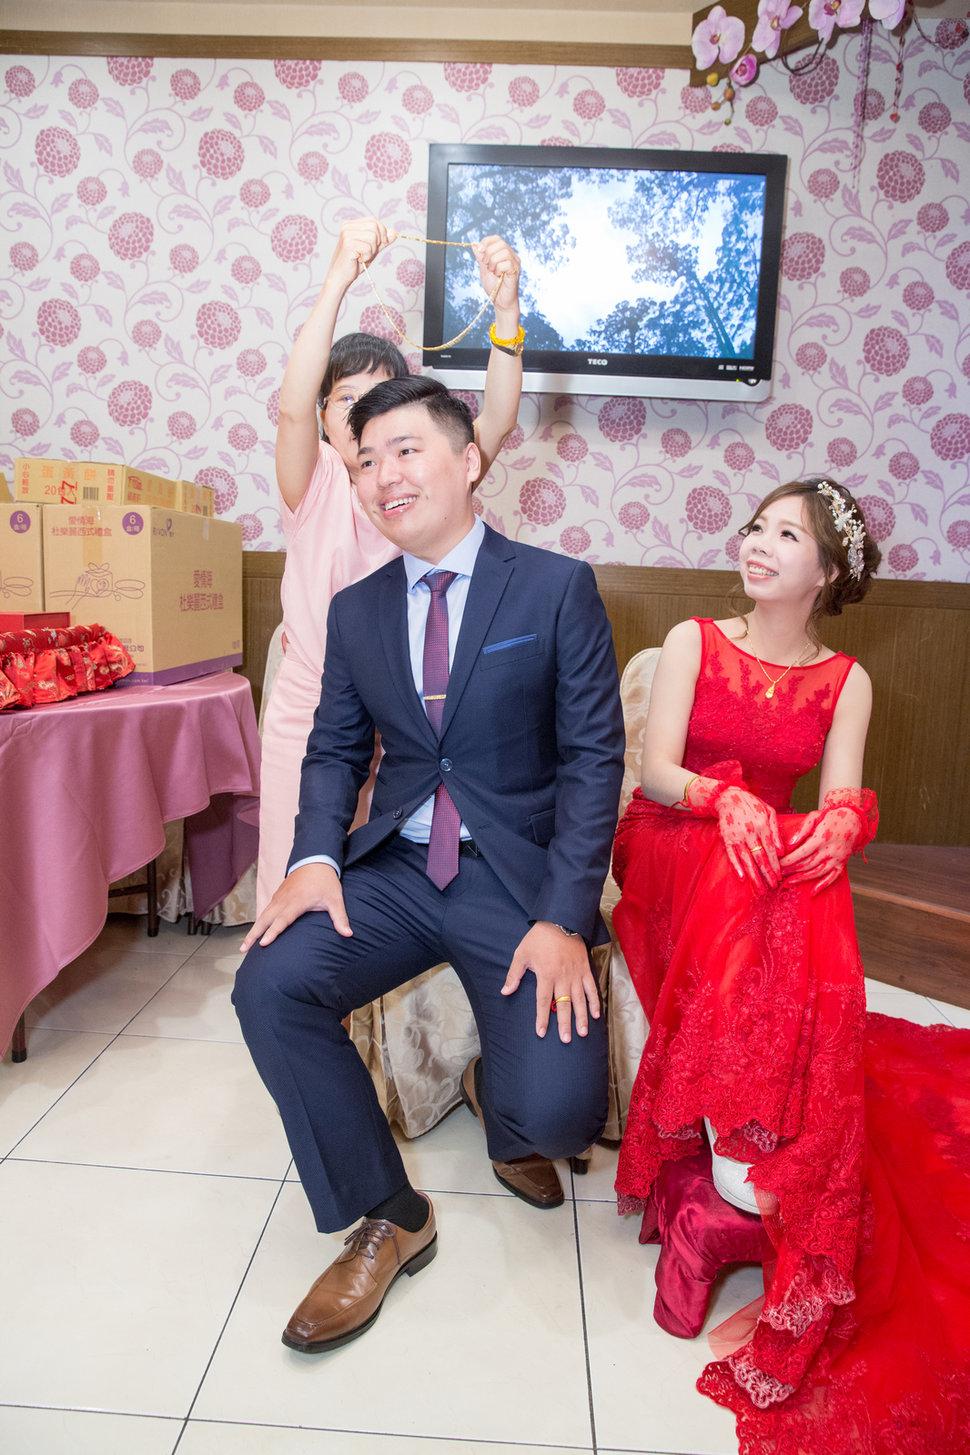 HANK9623 - 蛋拔婚禮紀錄 - 結婚吧